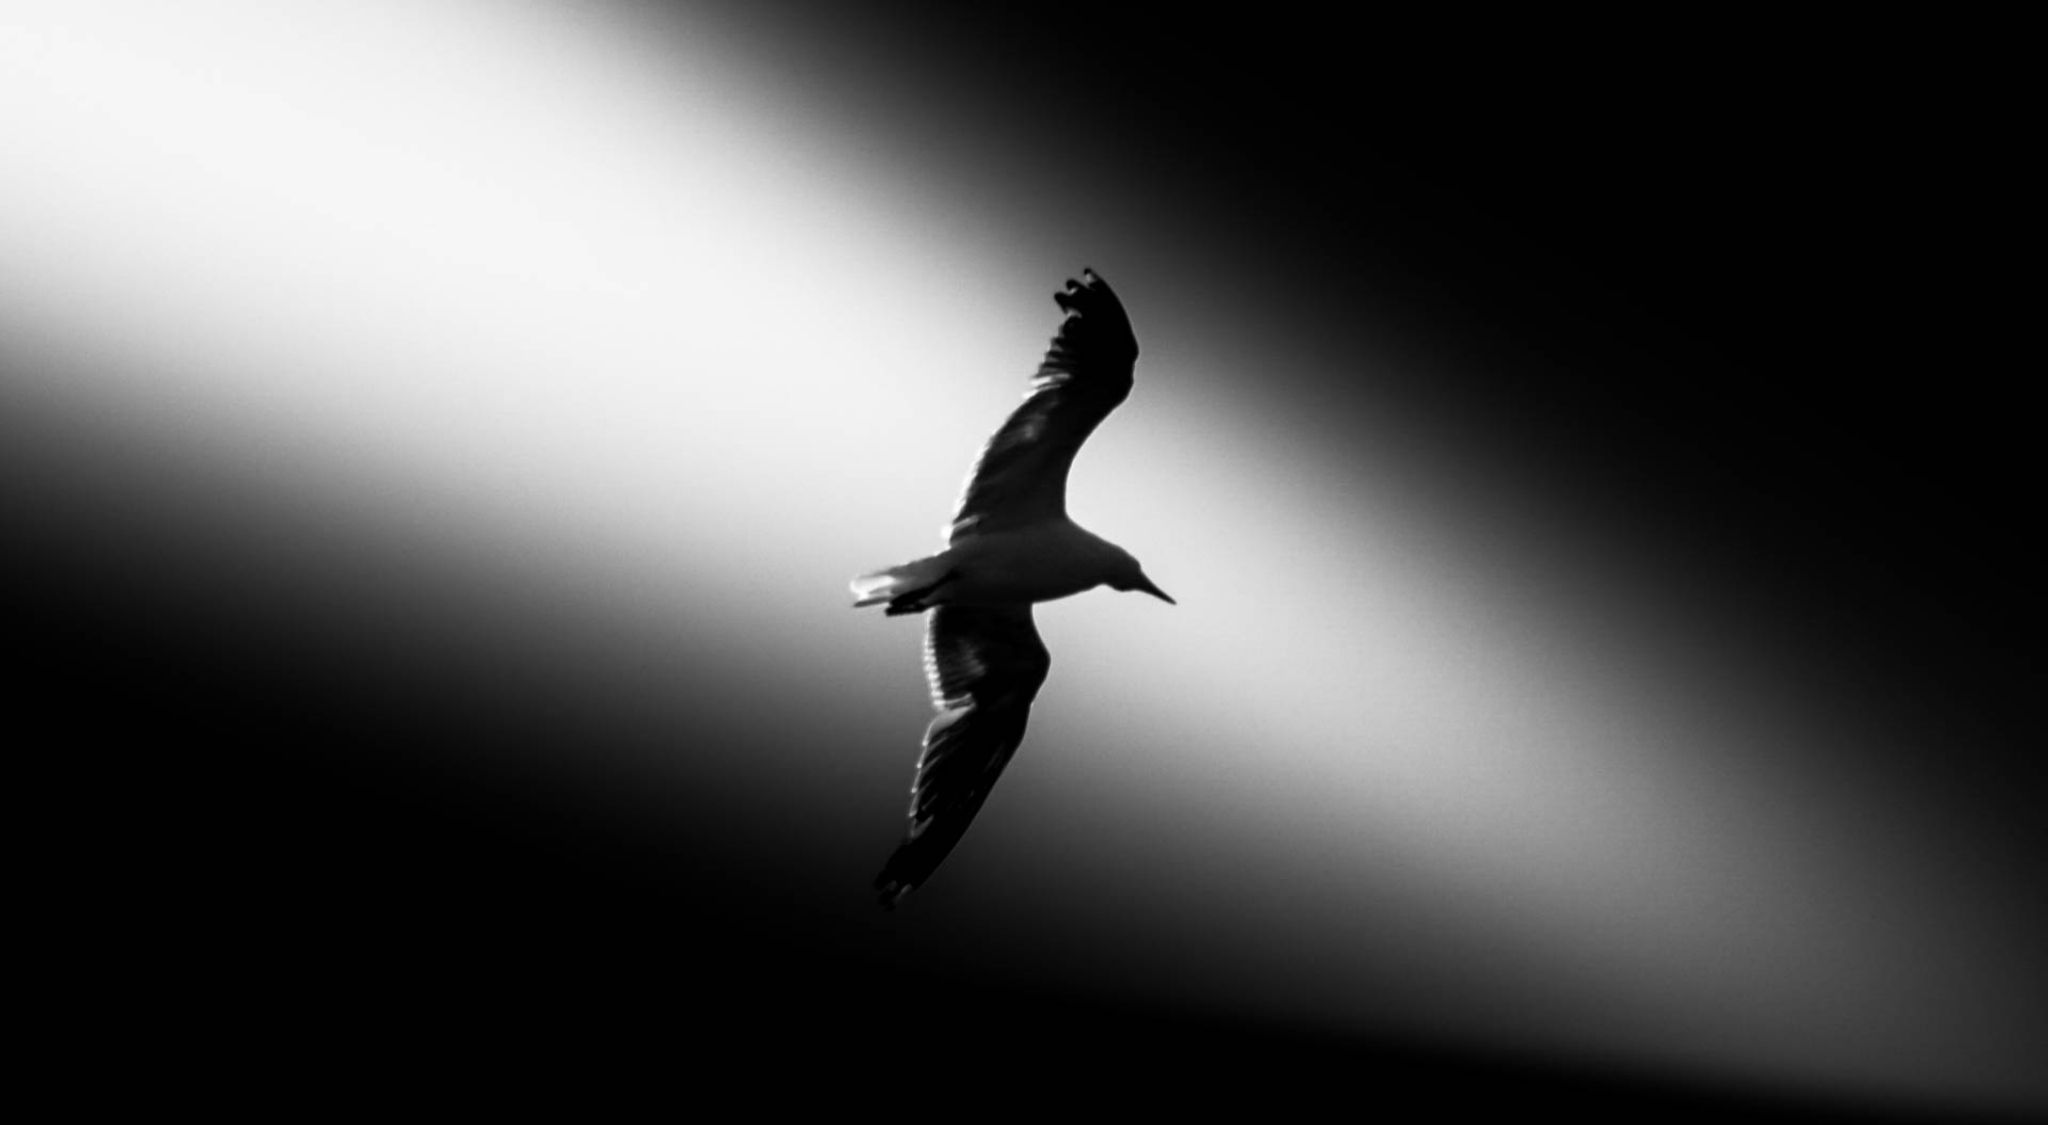 I ferret light   by Nazmul Hossain